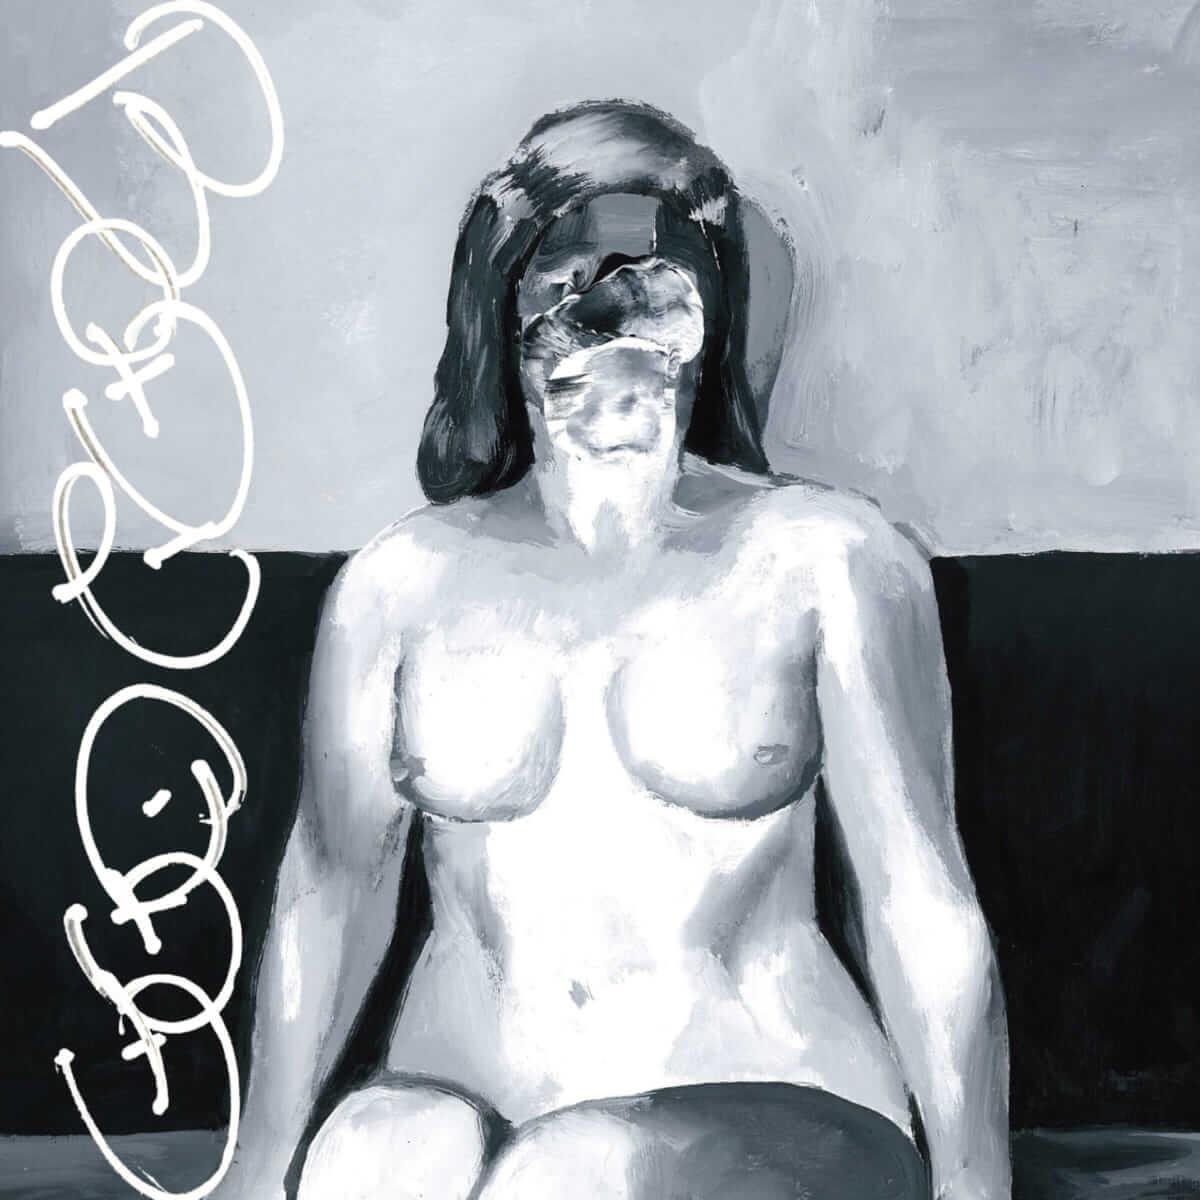 GEZAN×GHPDの「BODY ODD」からOMSBやUSOWAらが登場する三宅唱監督の新MVが公開 music180823-ghpd-gezan-bodyodd-1200x1200